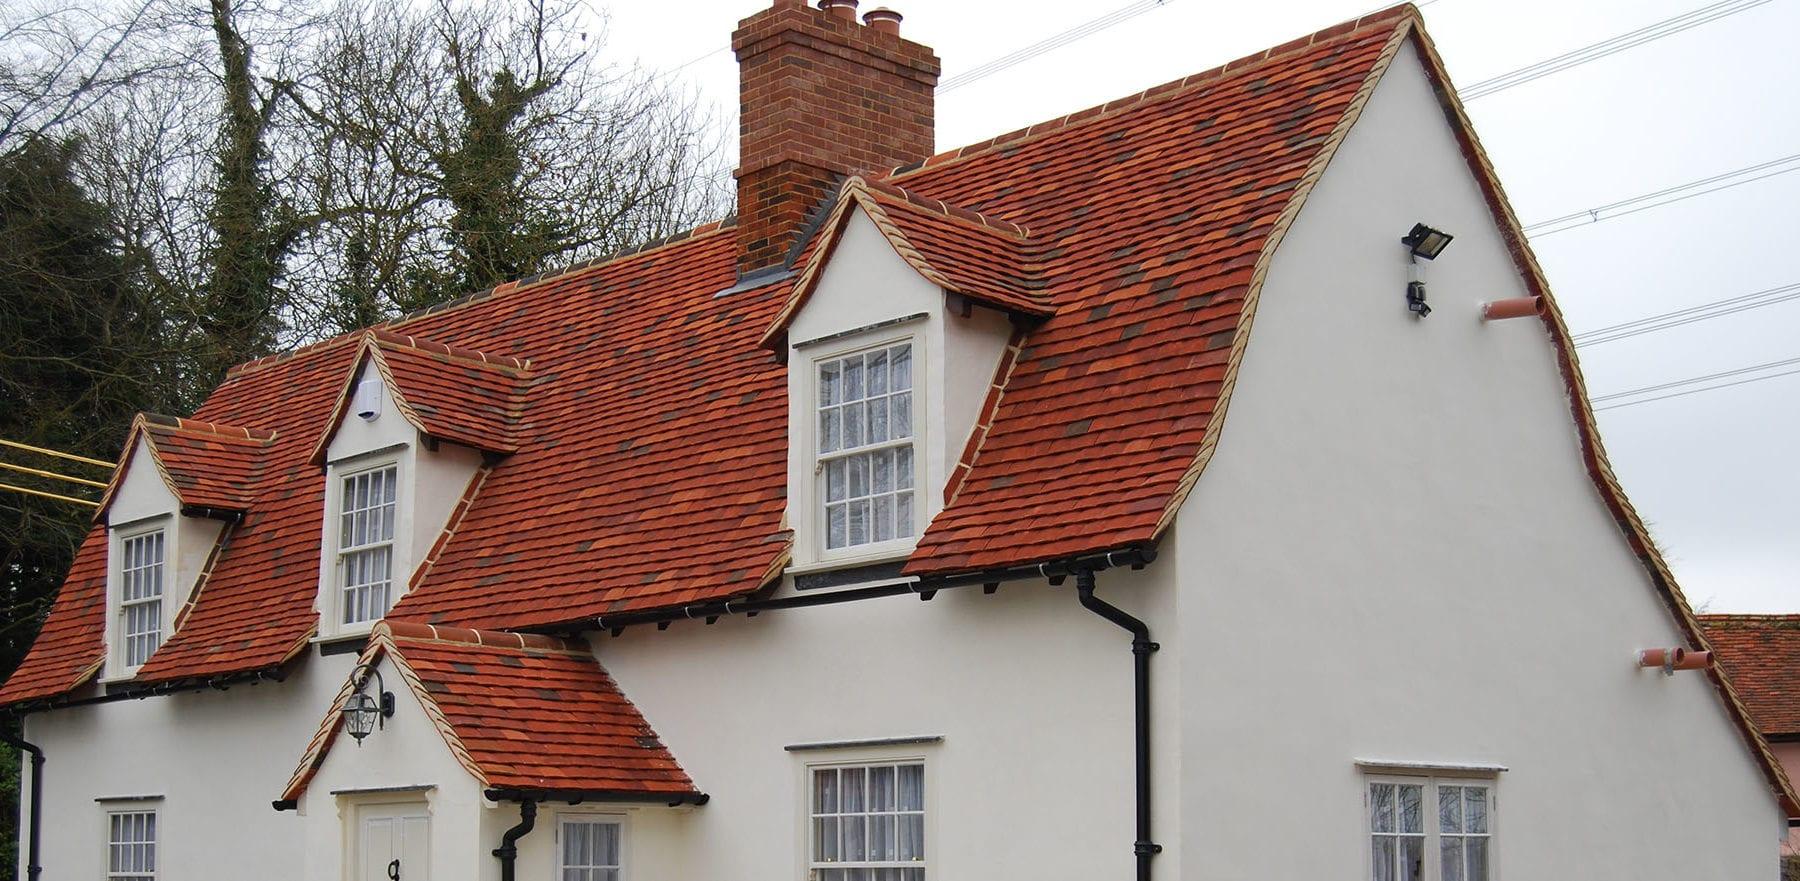 Lifestiles - Handmade Multi Clay Roof Tiles - Gainsford End, England 5